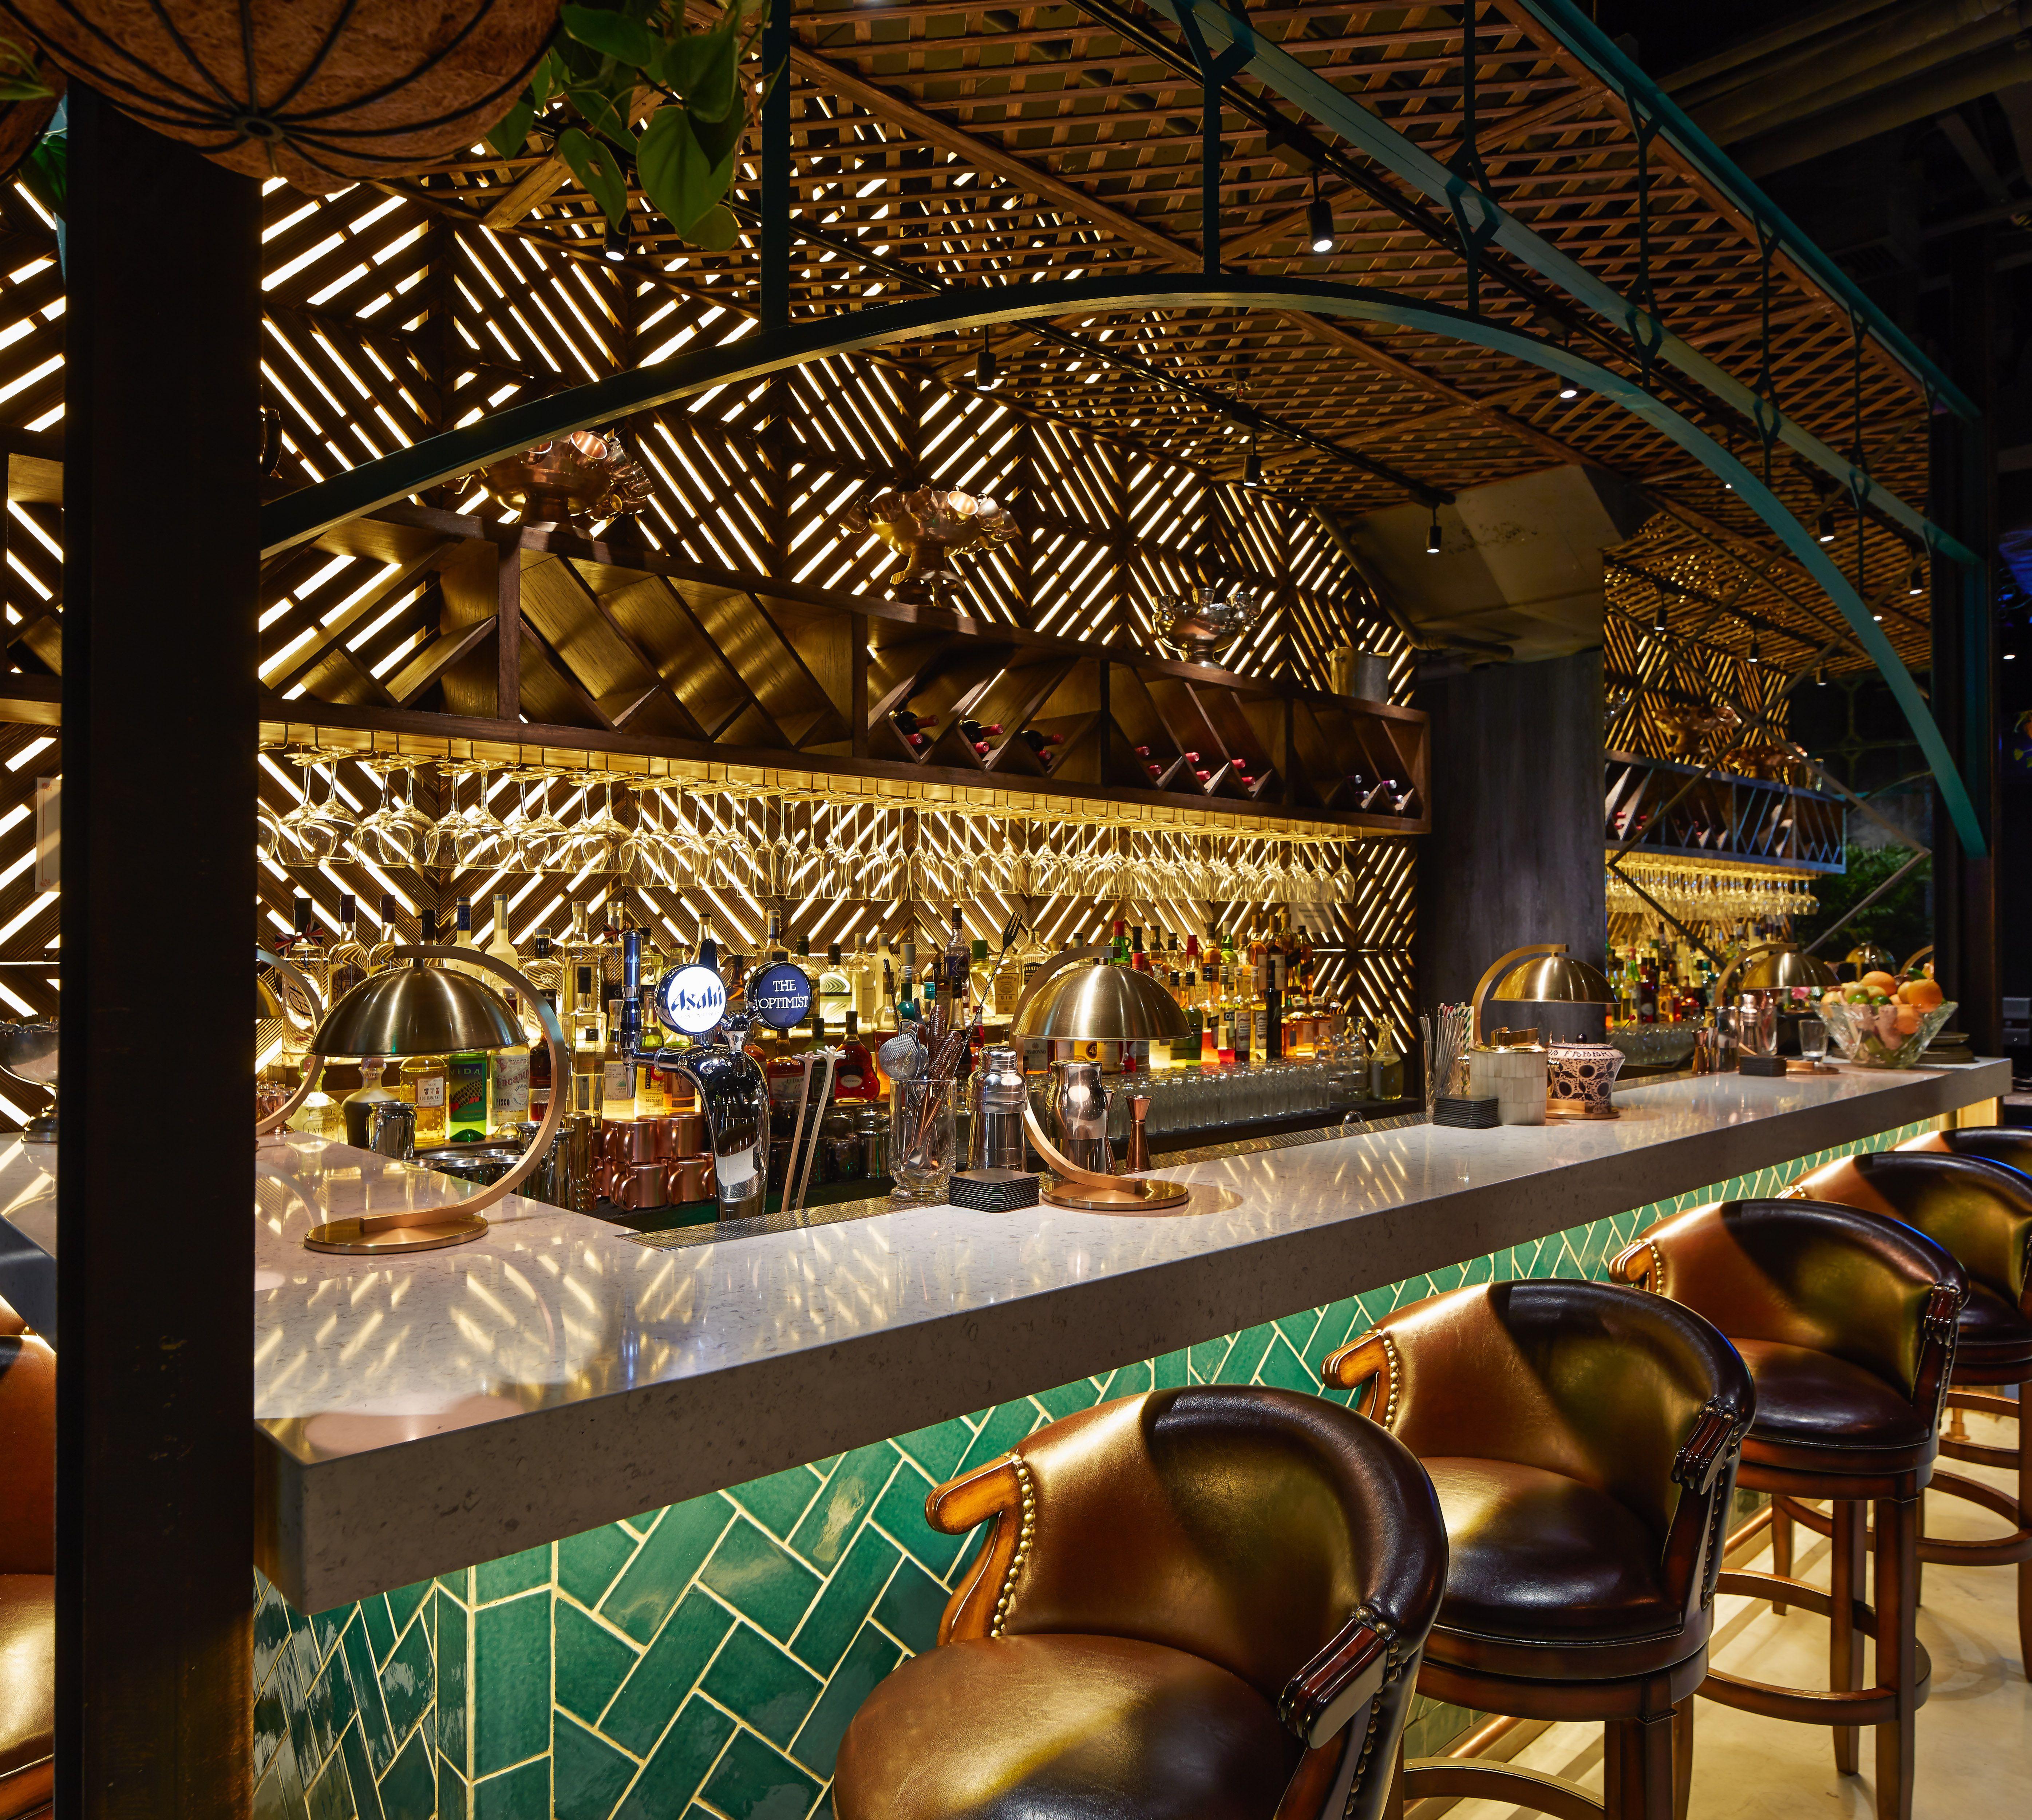 Bar And Lounge Interior Design: The Optimist - Bar (2)